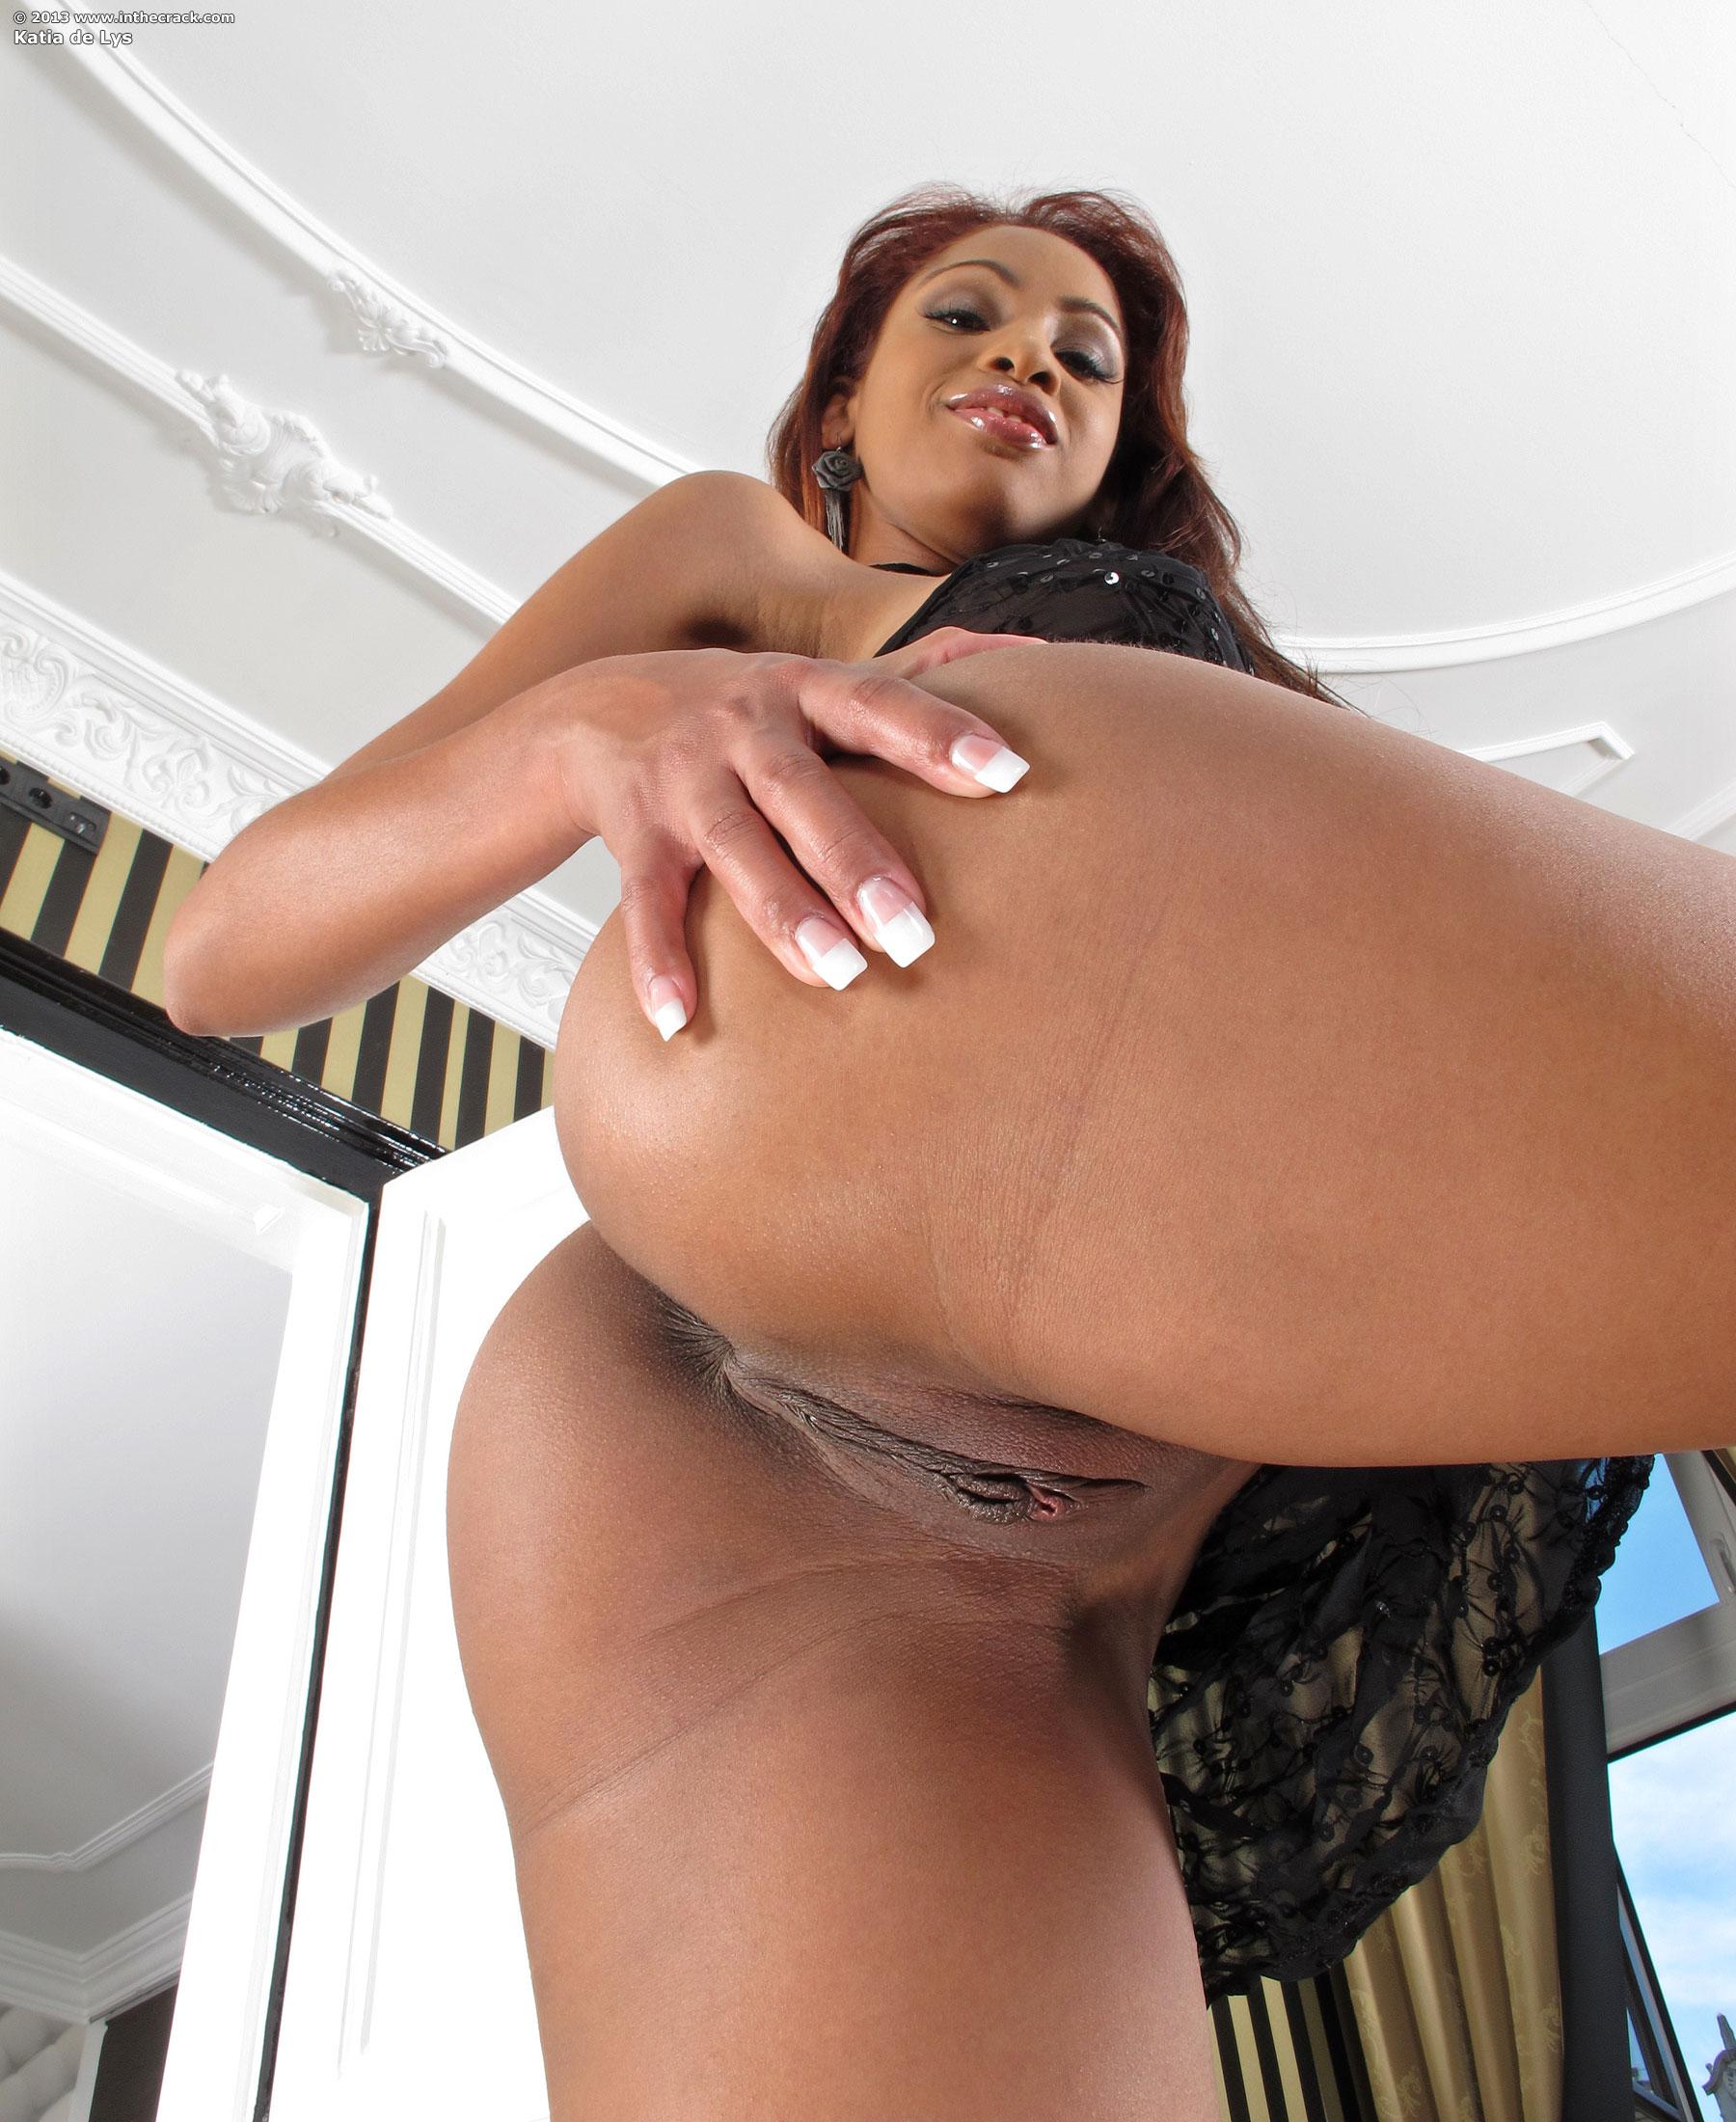 Negra fantastica exibindo seu delicioso corpo na cam - 3 part 3